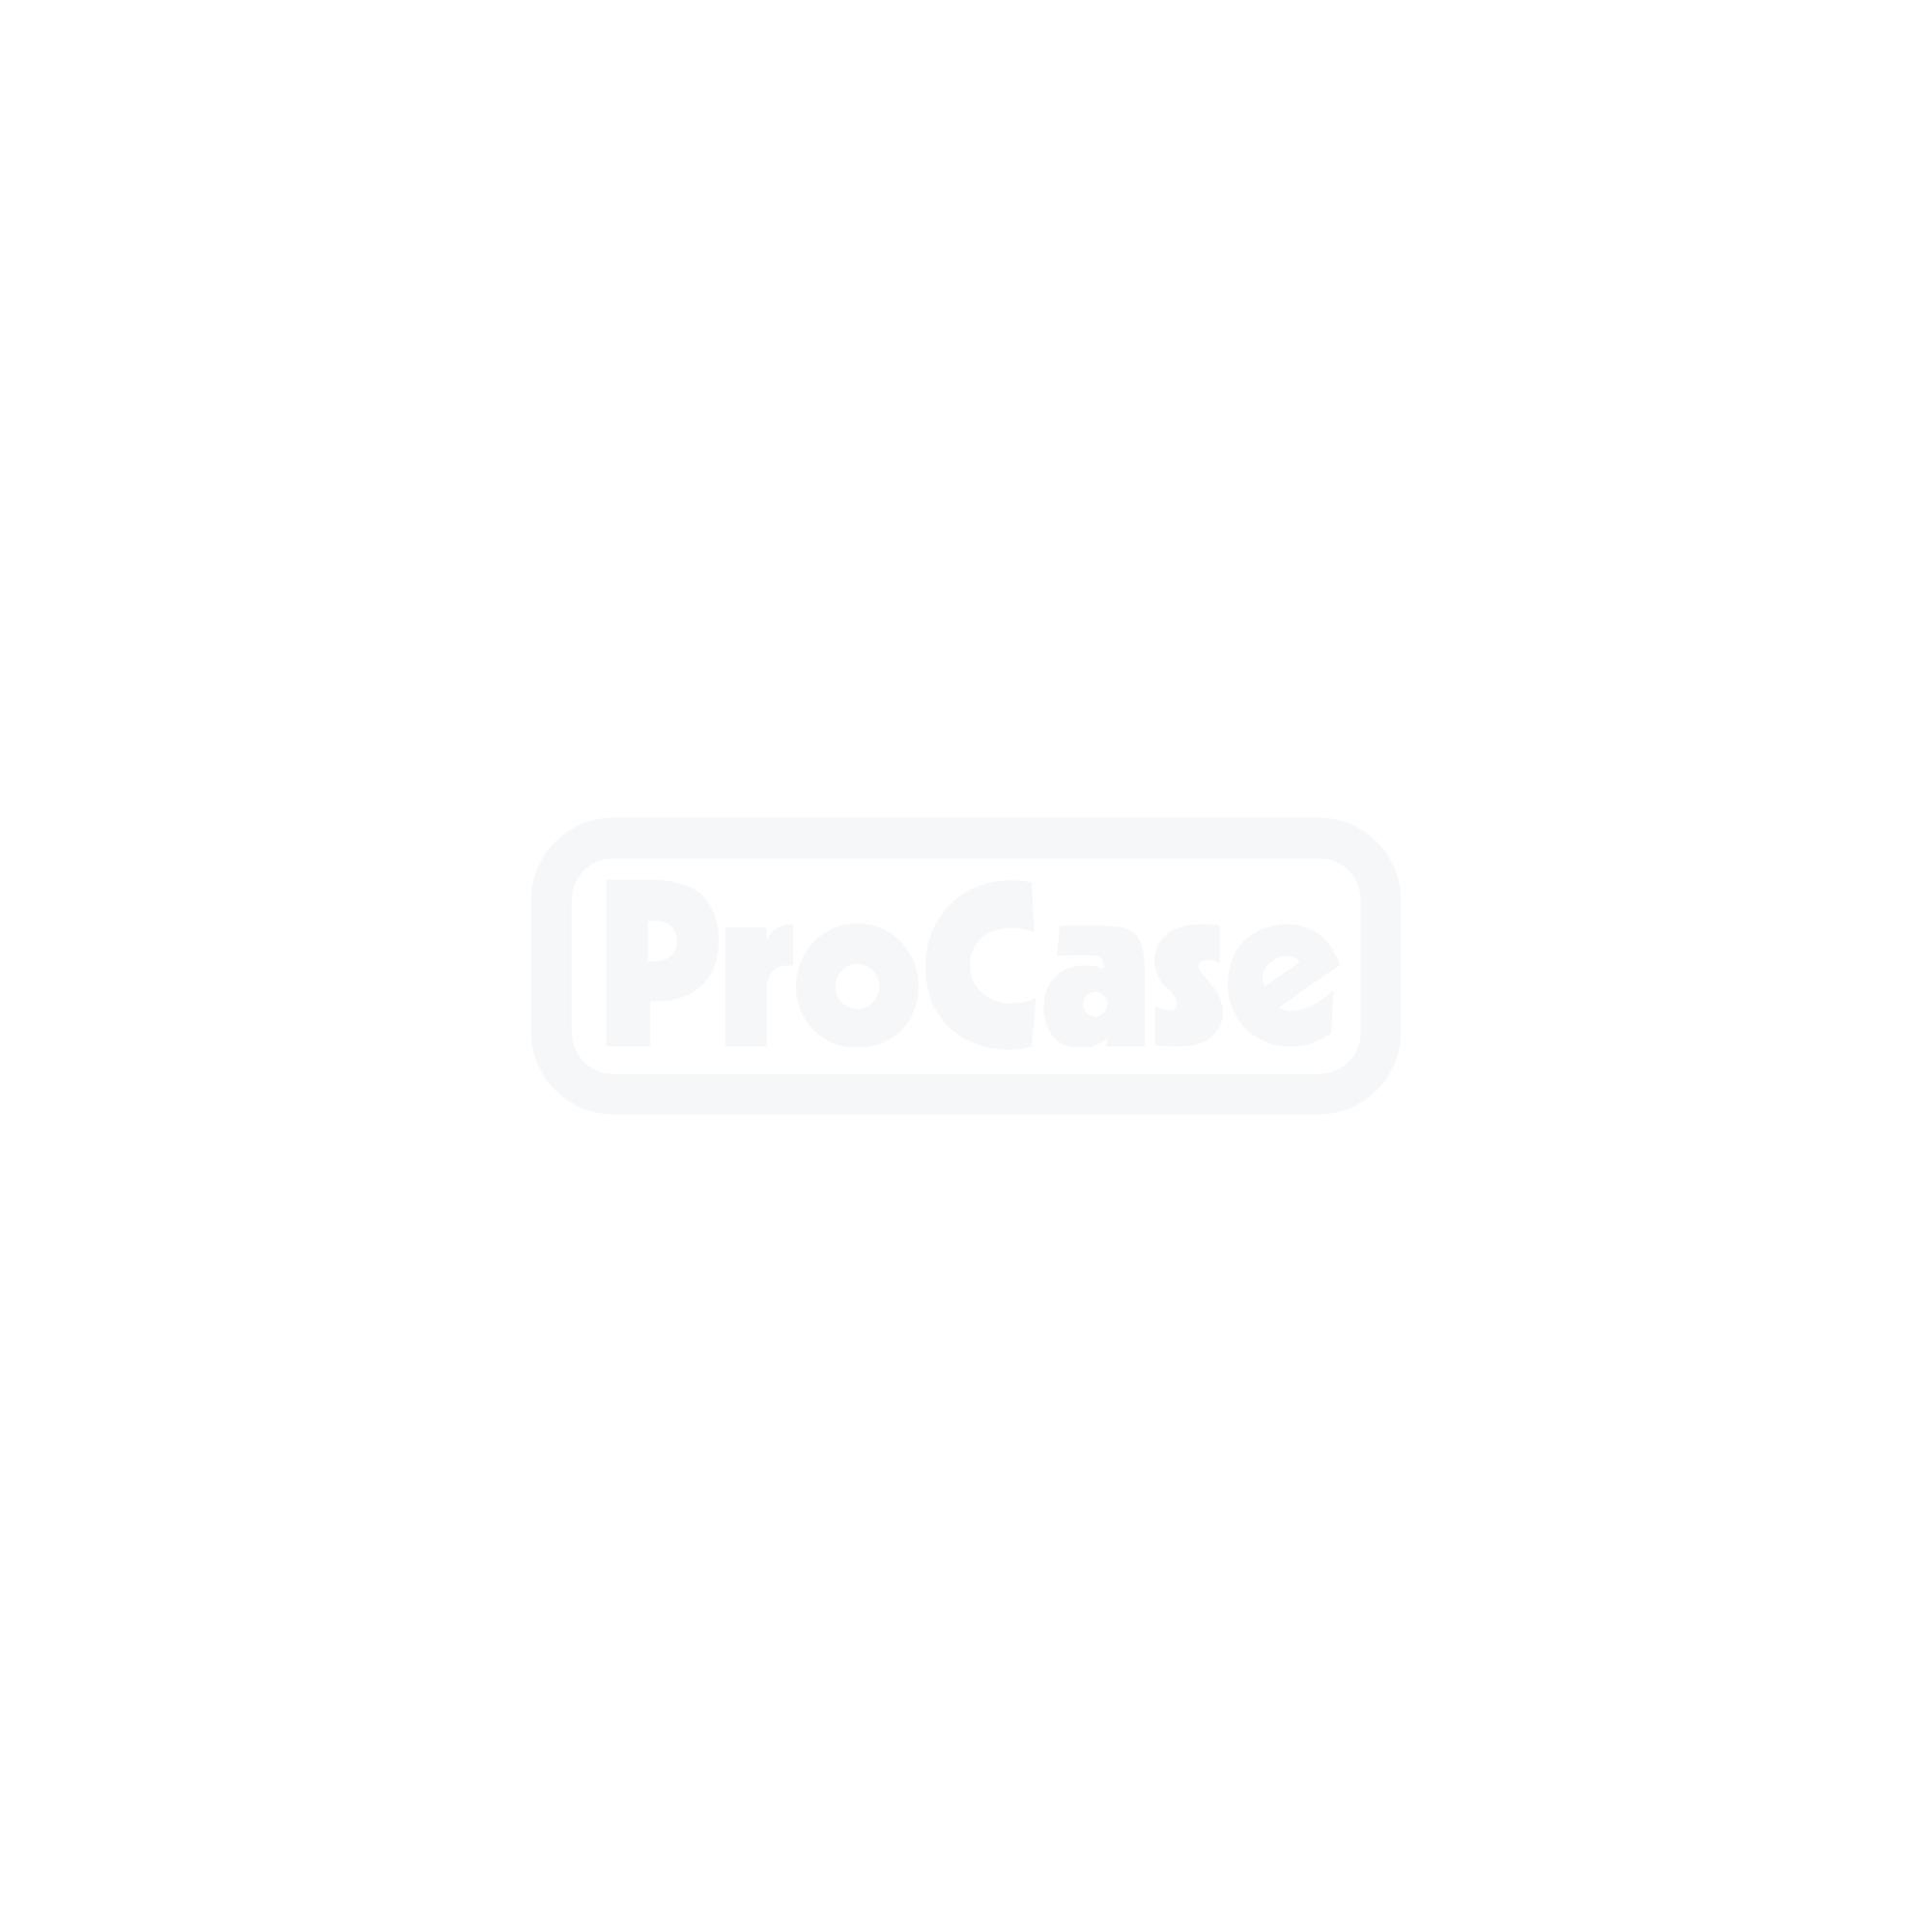 Flightcase für Tridelity MV6500 Display